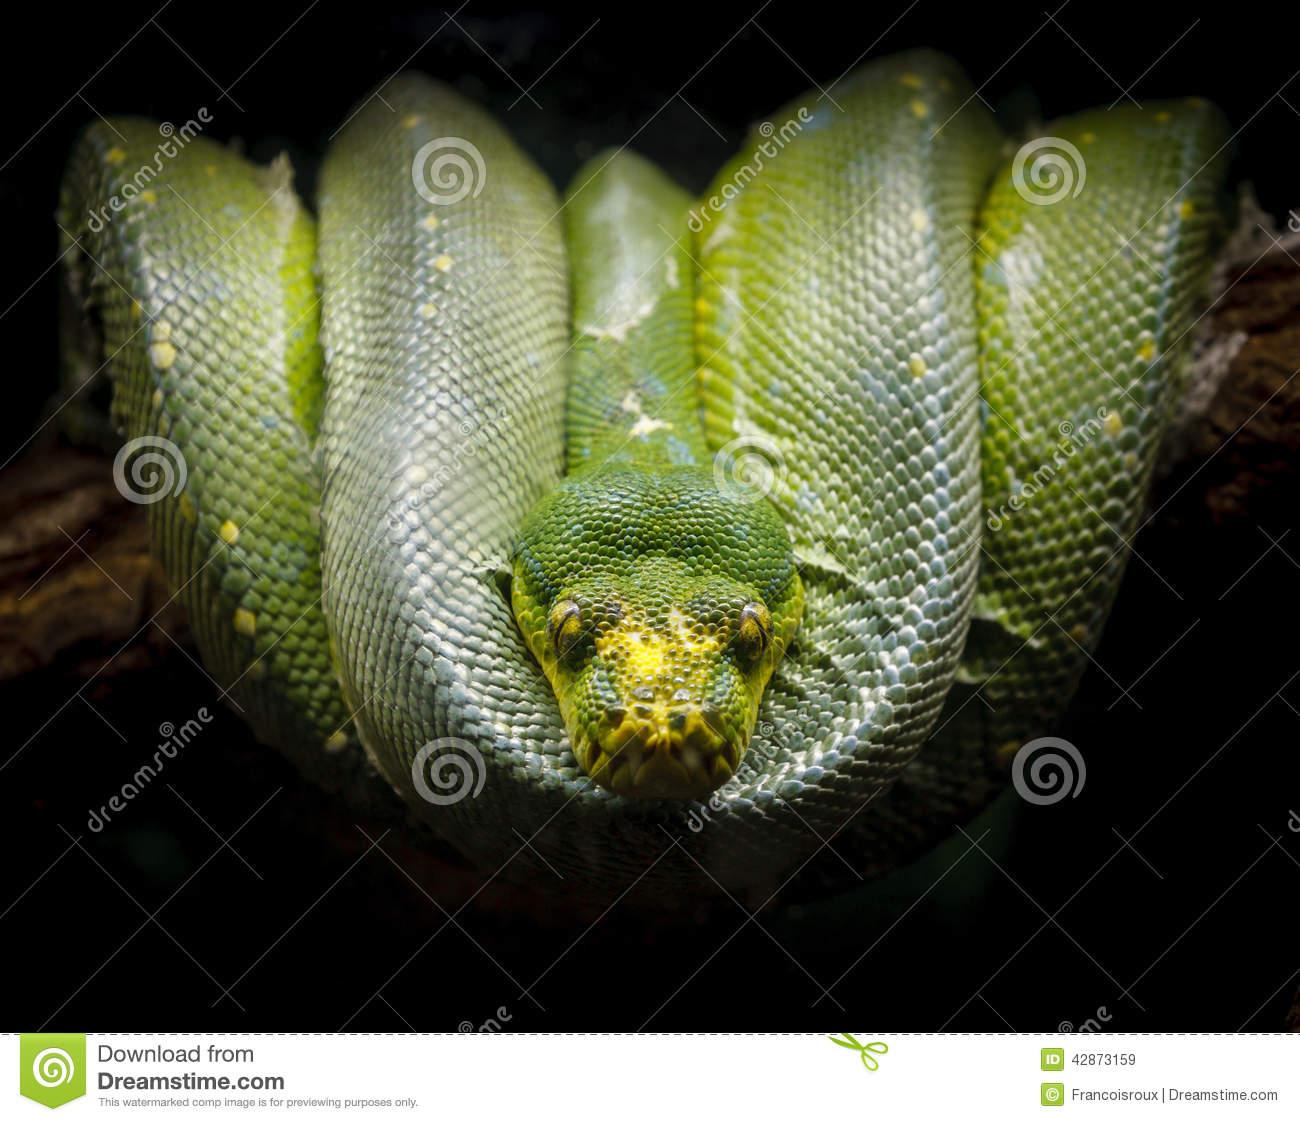 Green Tree Python Coiled On A Branch. Morelia Viridis. Stock Photo.